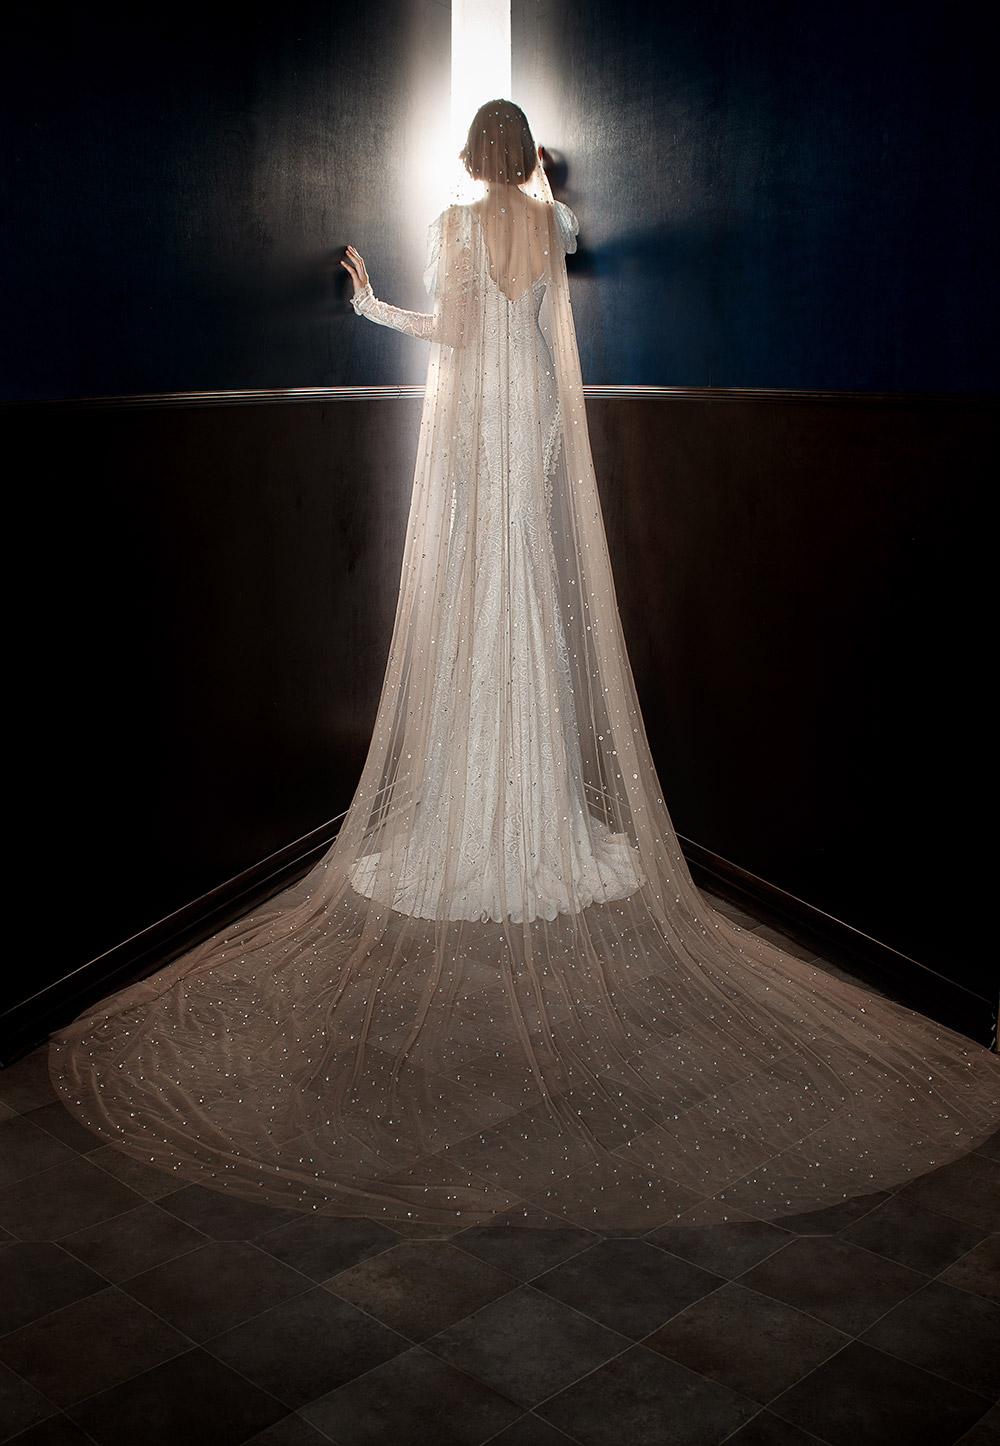 Stardust Veil - Galia Lahav Spring 2018 Bridal Collection. www.theweddingnotebook.com